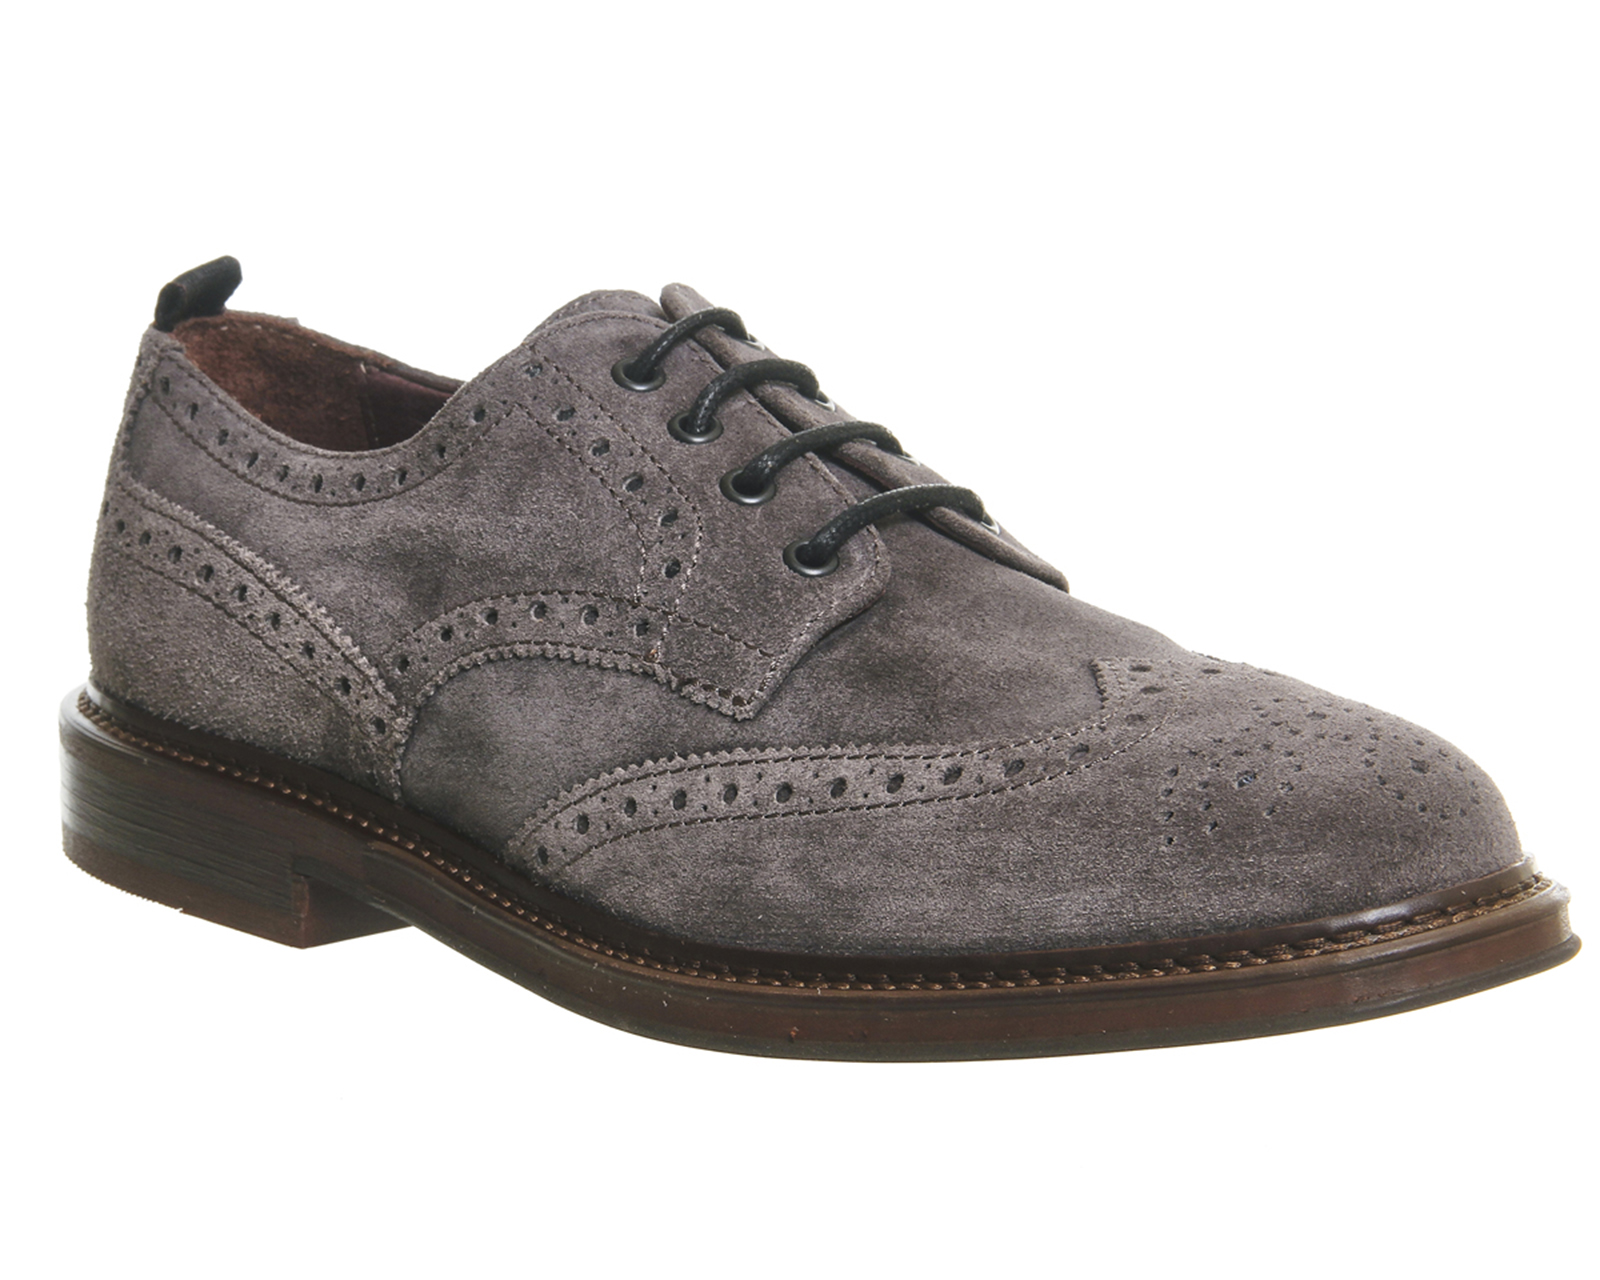 mens poste caeser brogues grey suede formal shoes ebay